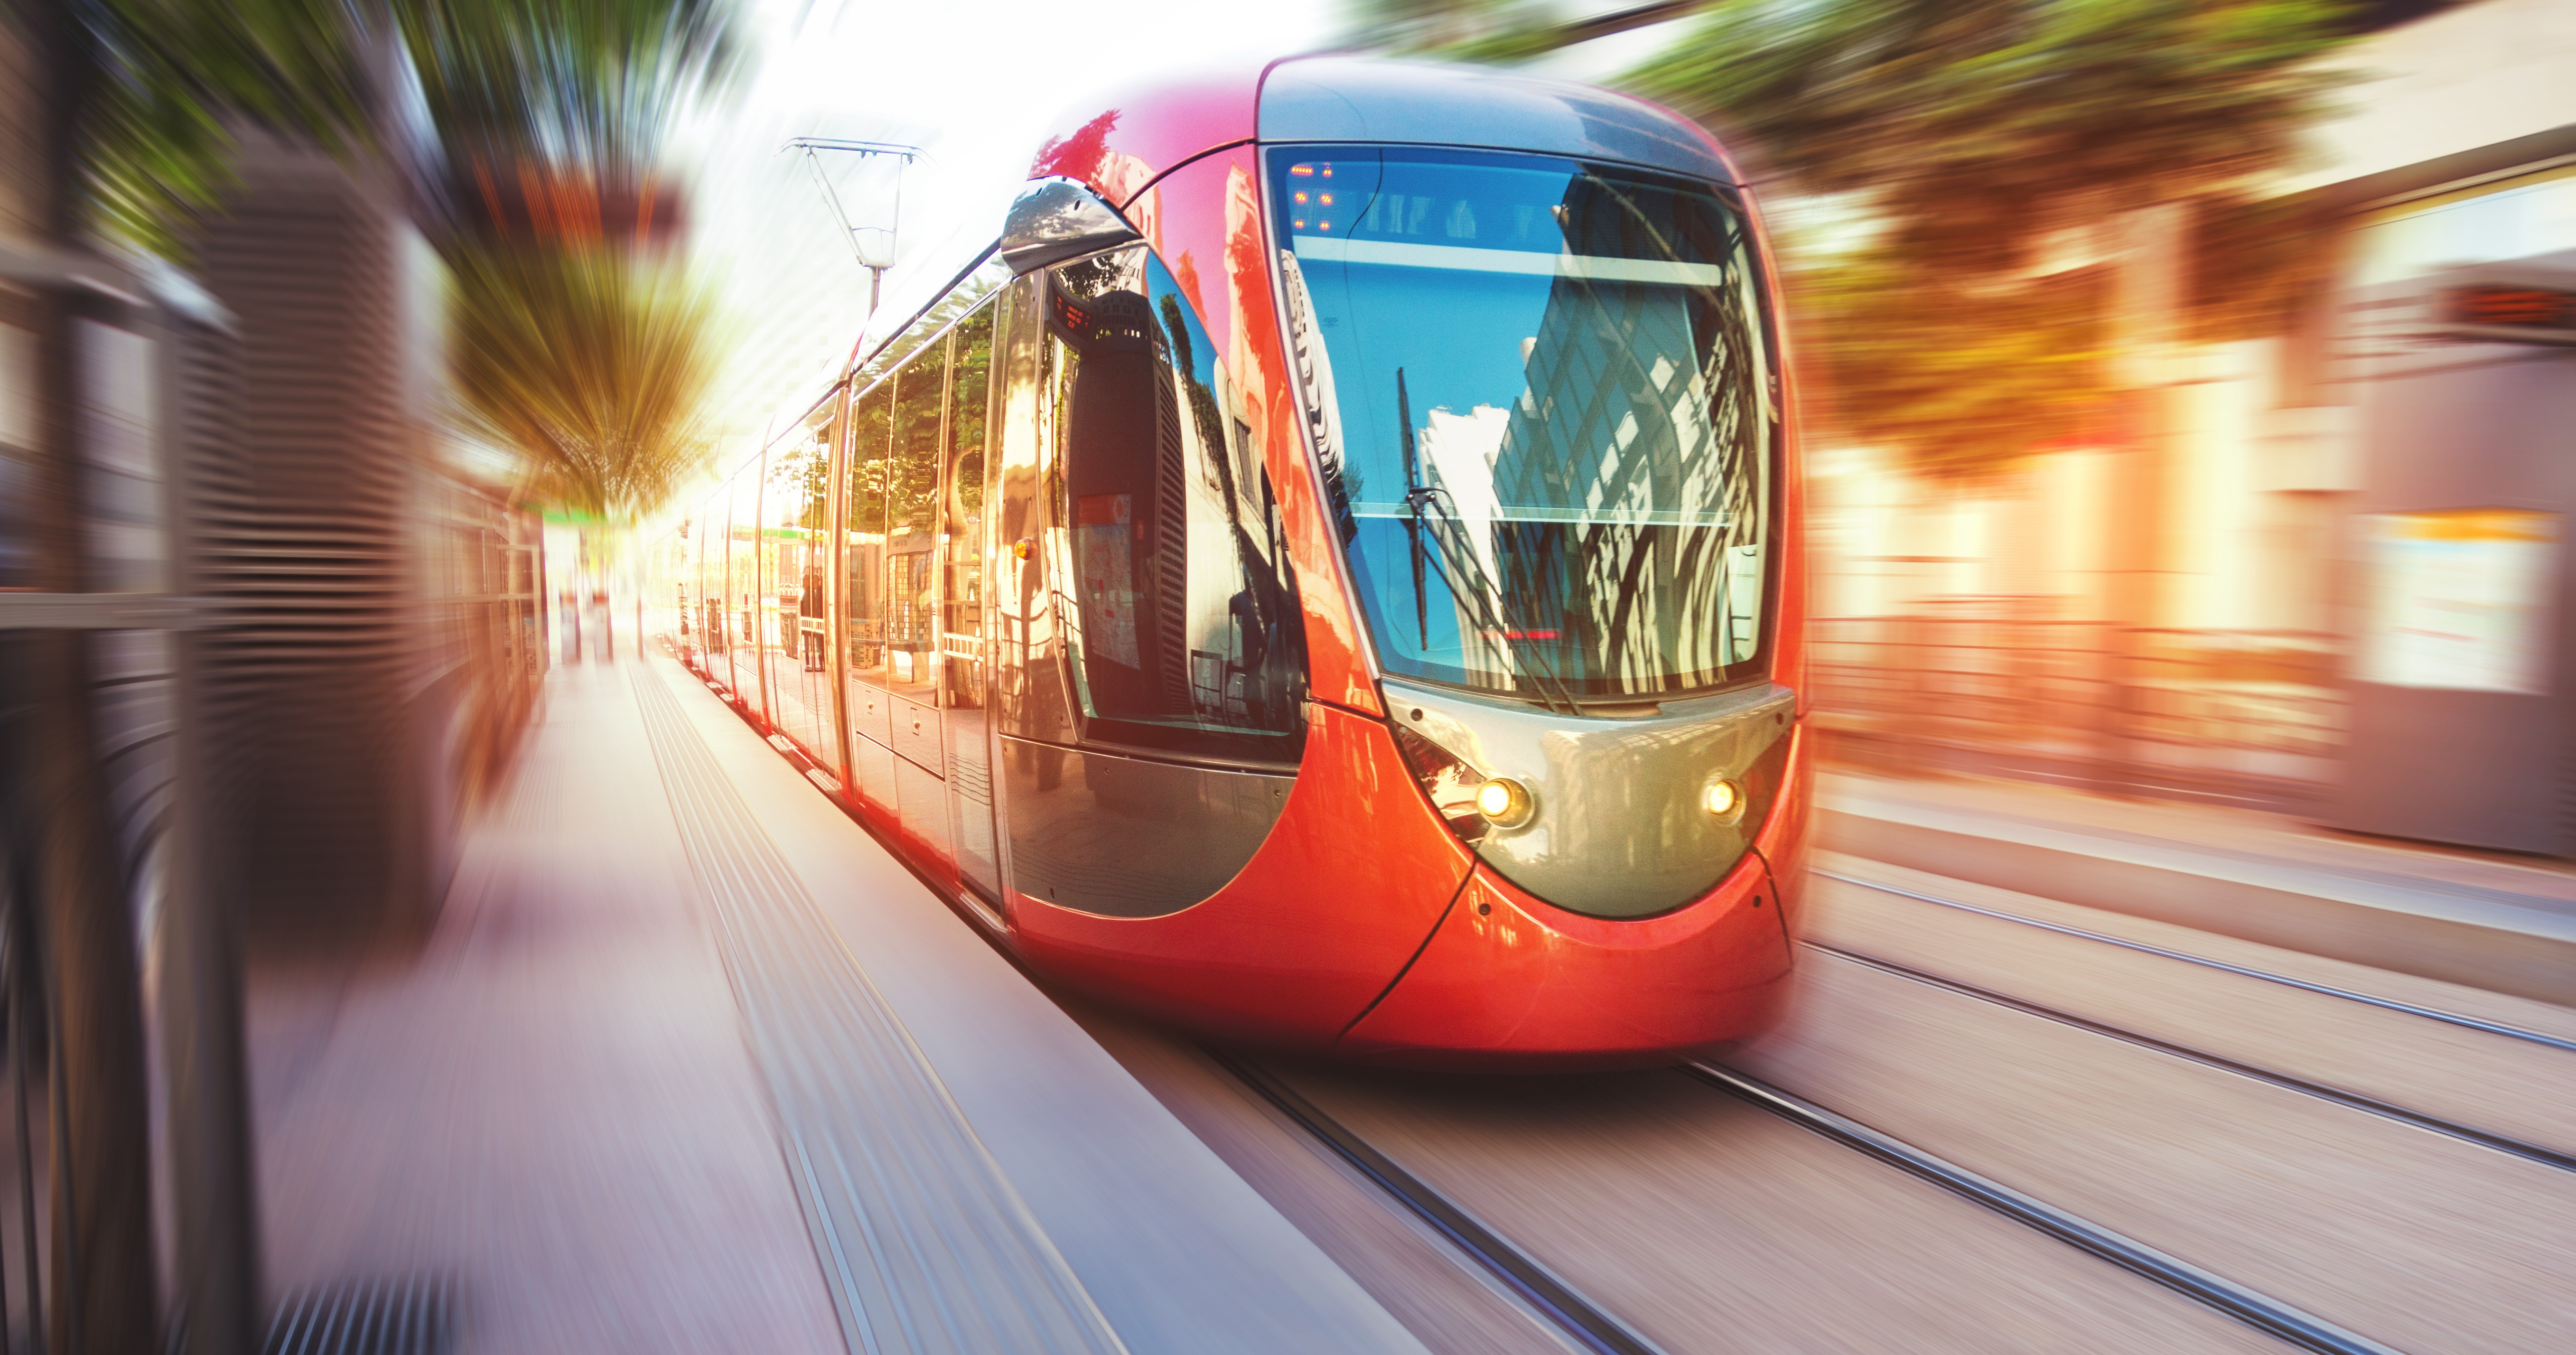 Modern red tram on city street